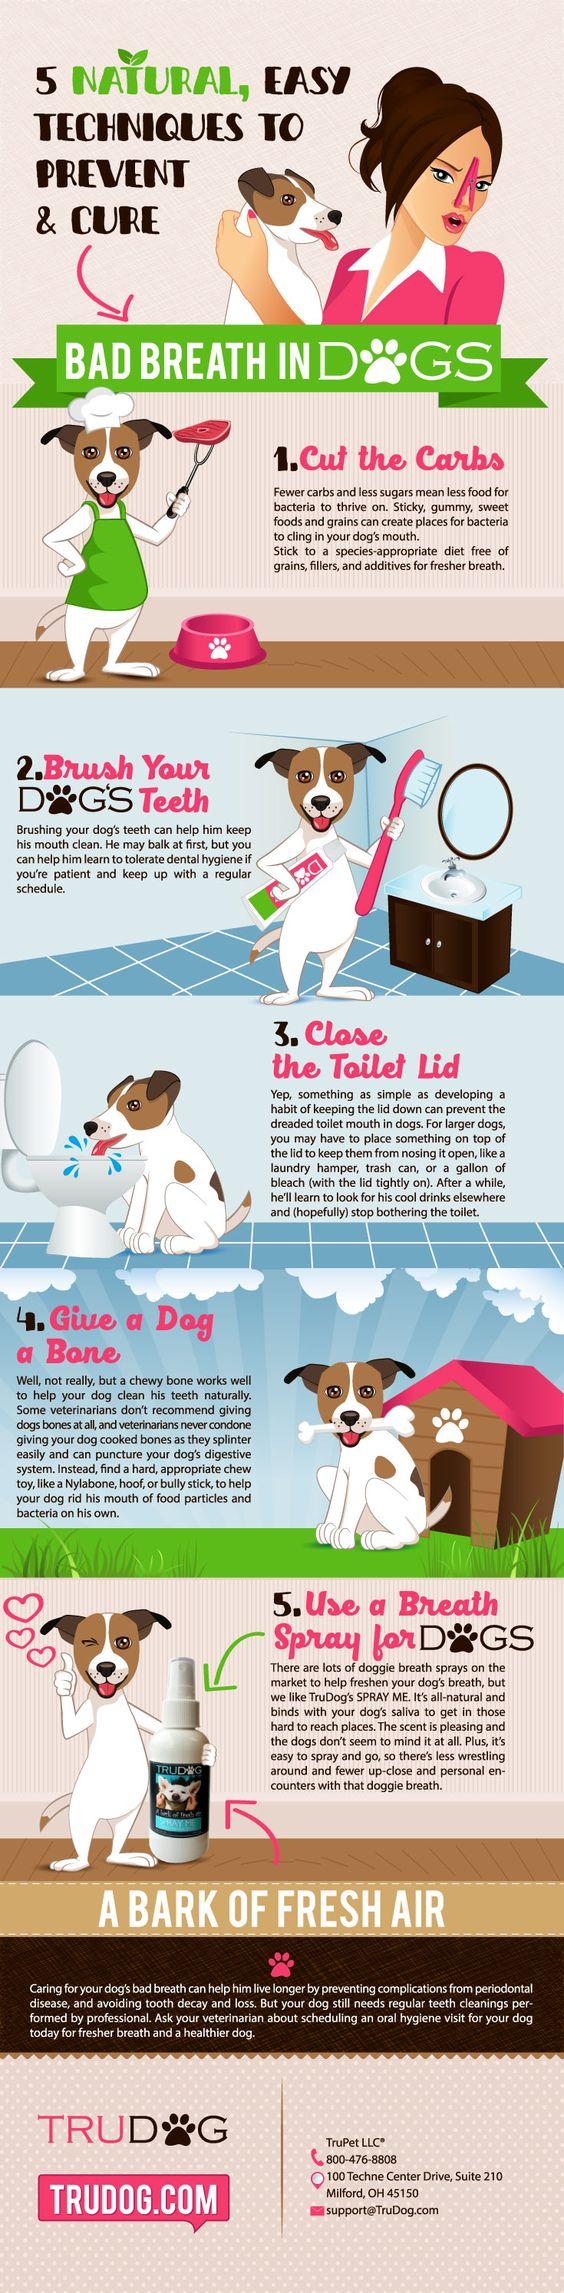 Discover 5 Natural/Easy Techniques to Prevent & Cure Bad Breath in Dogs http://trudog.com/lp/spray-me-3-p?utm_source=Pinterest&utm_medium=social&utm_campaign=Jeremy%20Pinterest&utm_term=organic&utm_content=5%20Techniques%20new